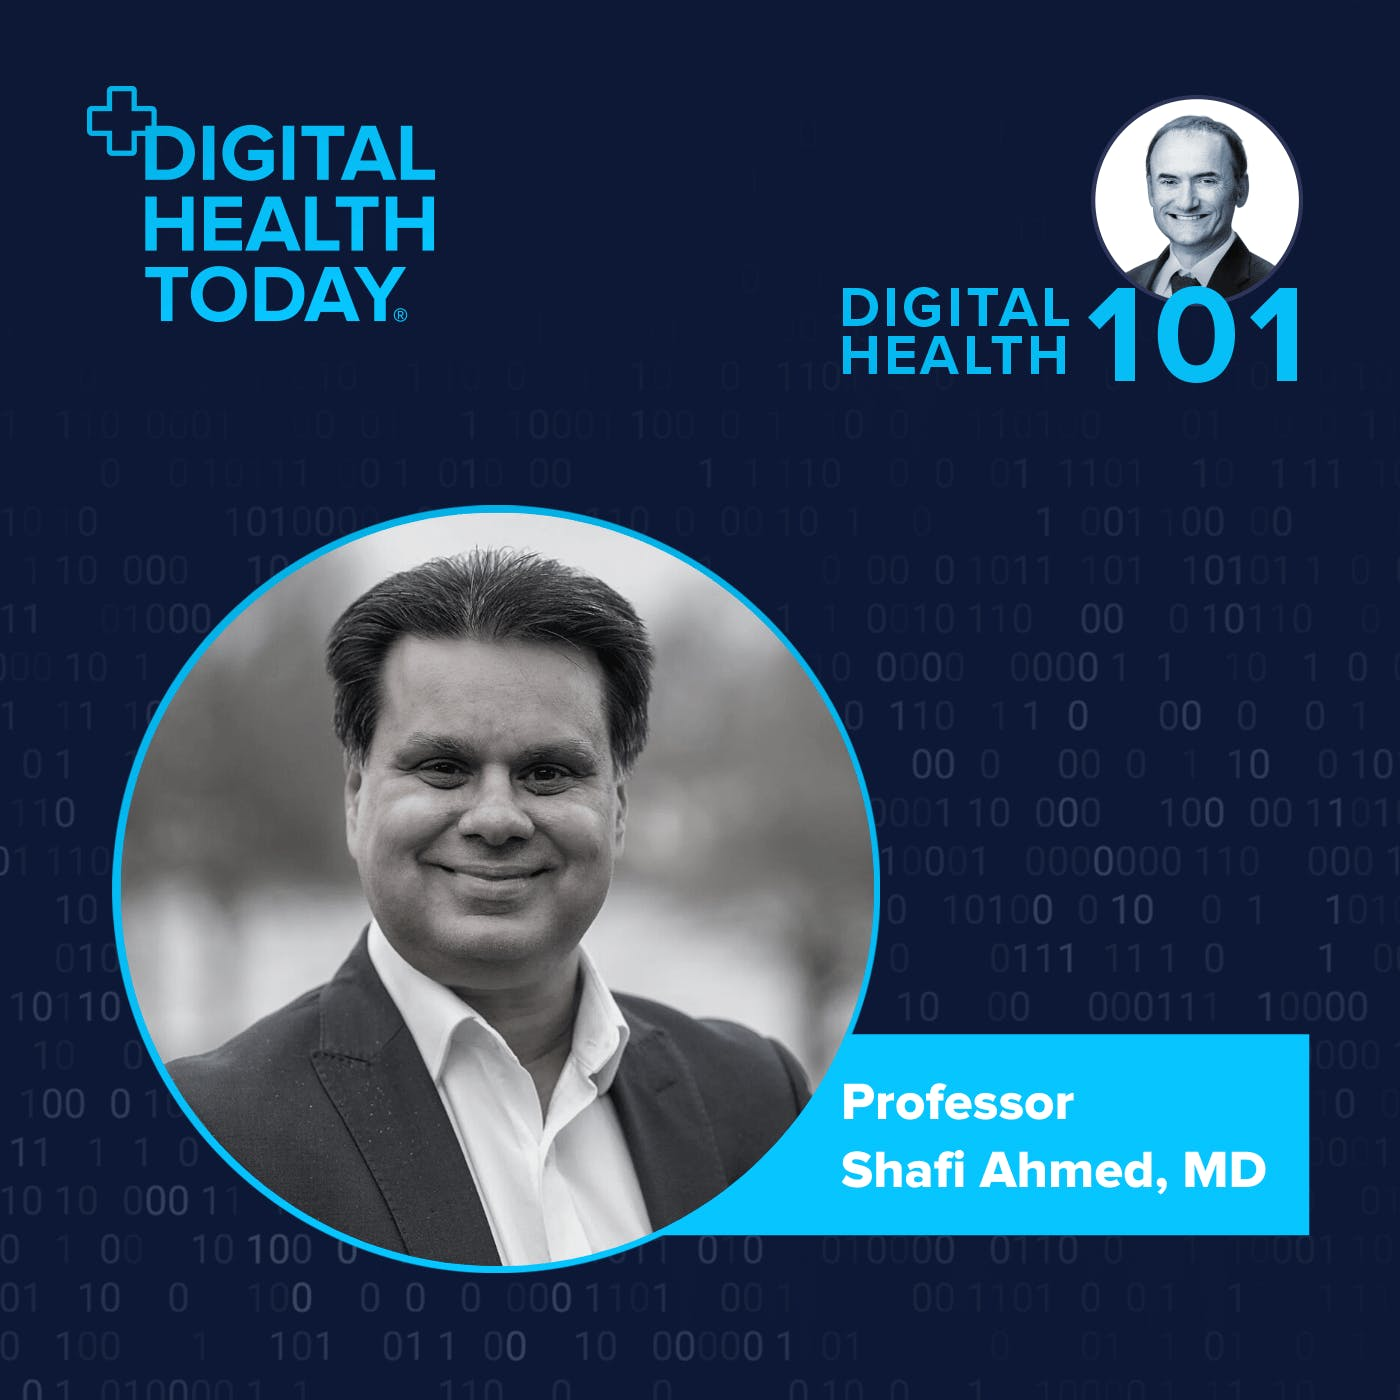 Shafi Ahmed on Democratizing Surgical Training Through Virtual Reality